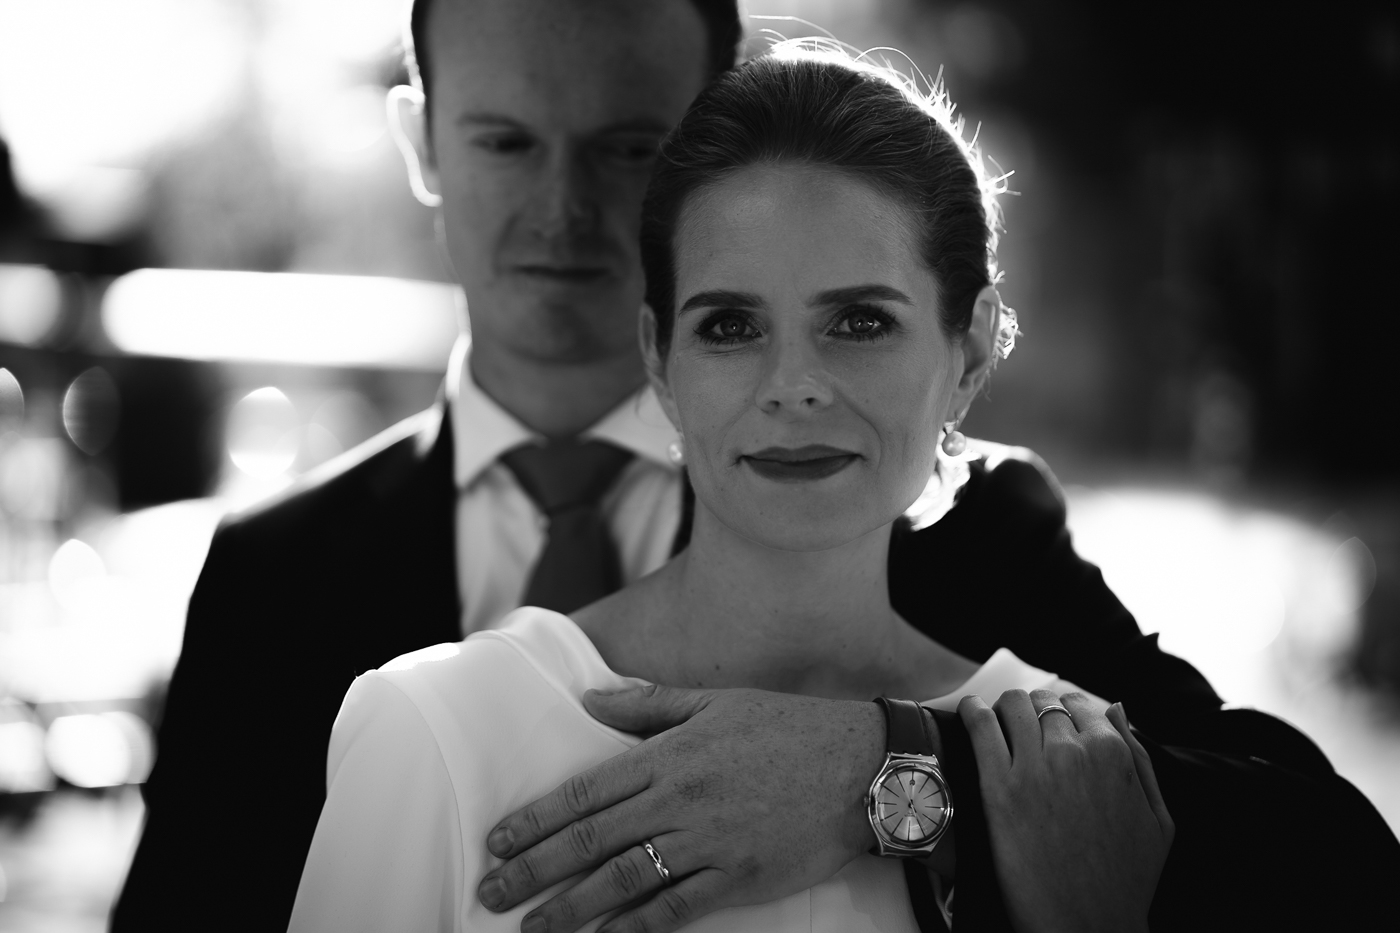 bruidsfotografie-trouwfotograaf-wedding-photographer-amsterdam-James-Jantine-297-2.jpg